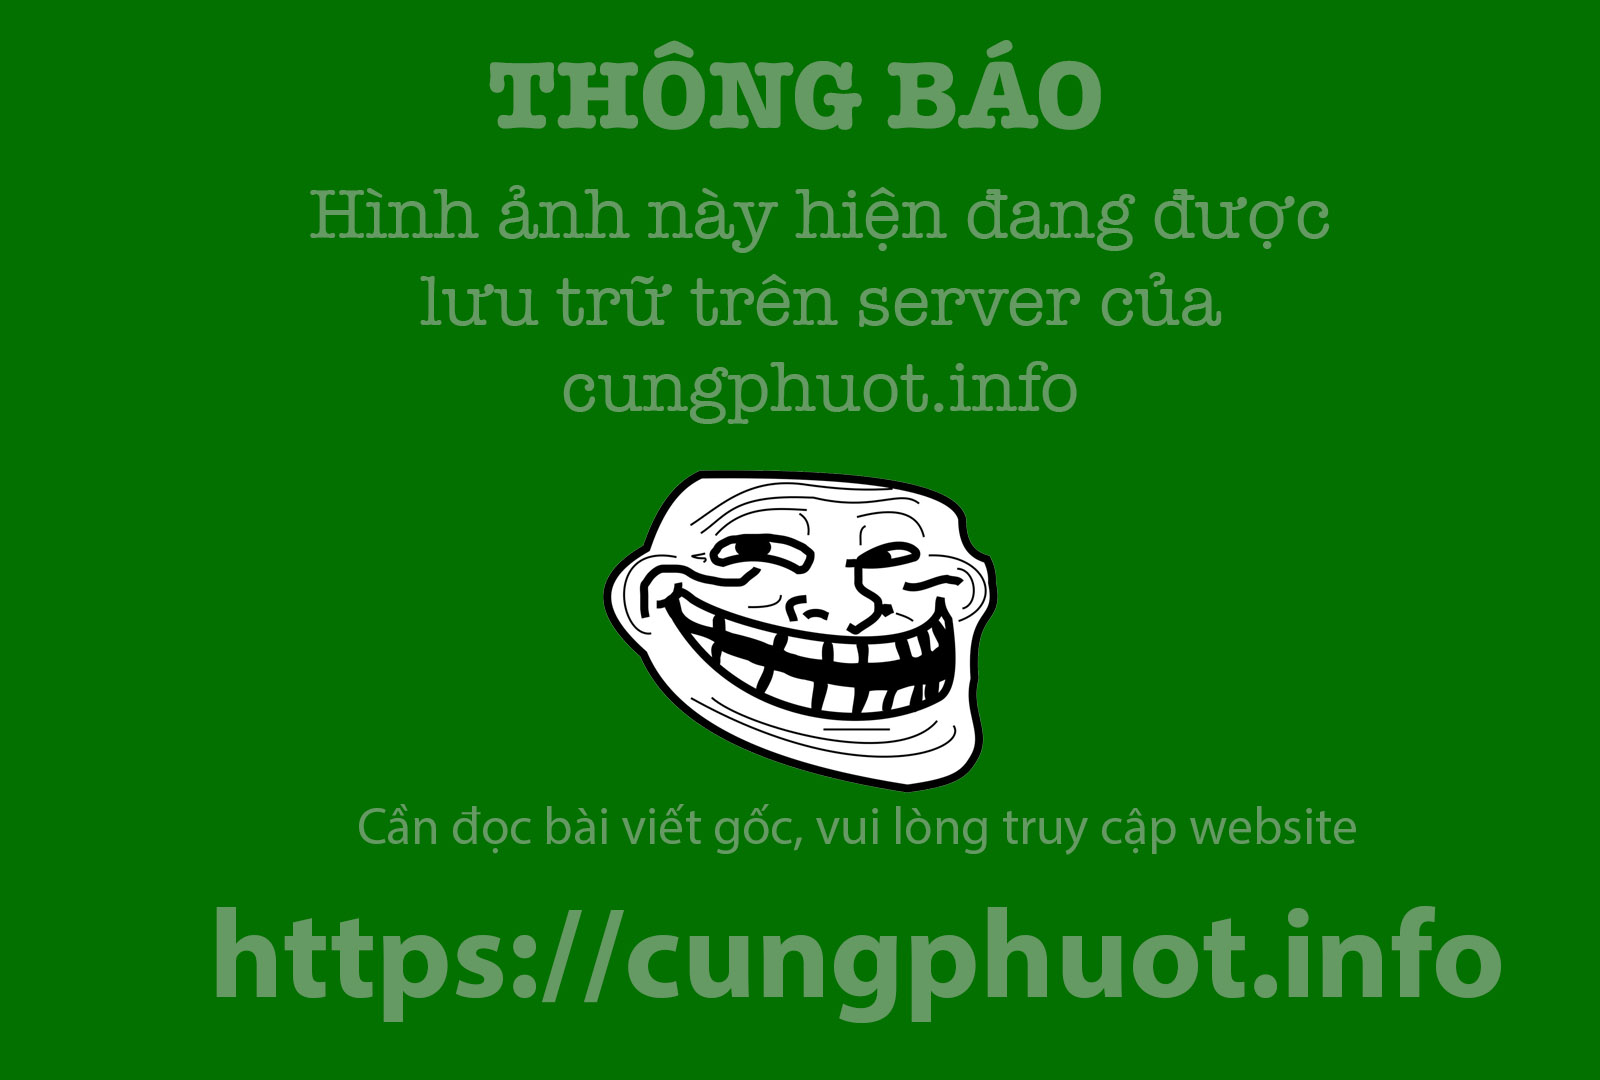 Co do Lam Kinh nhin tu tren cao hinh anh 4